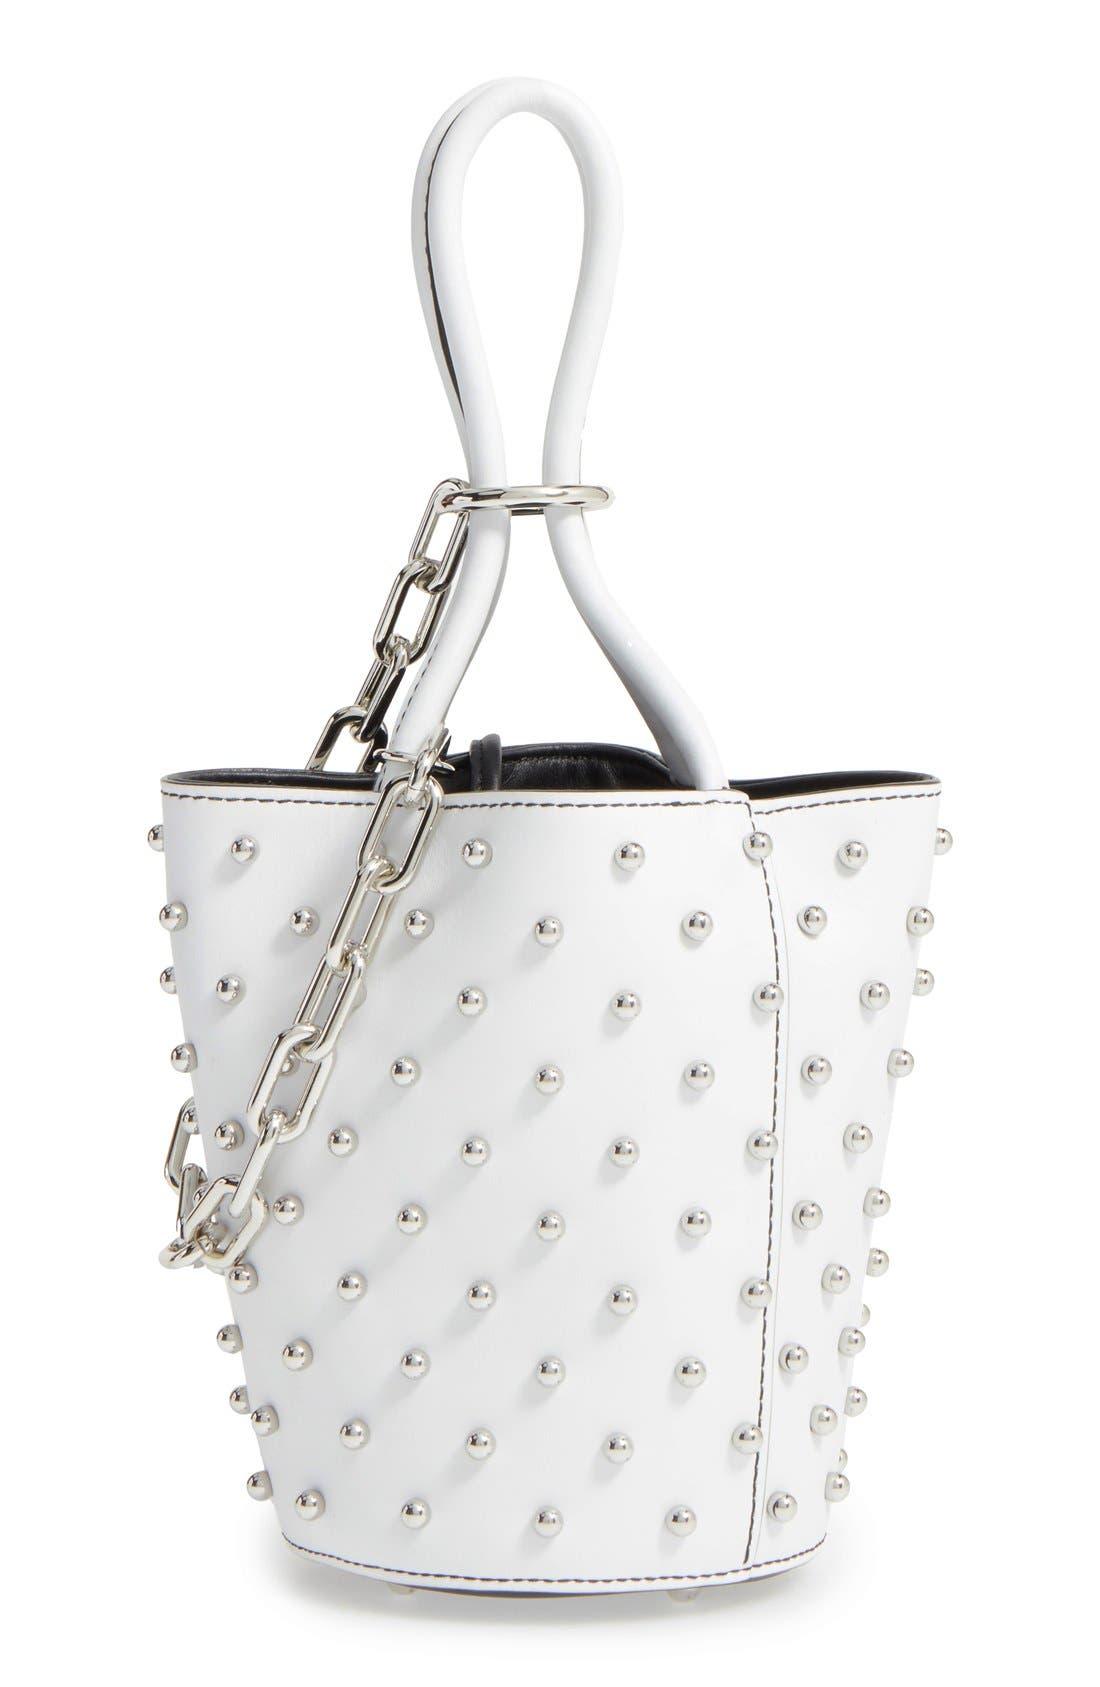 Main Image - Alexander Wang Mini Palladium Leather Bucket Bag